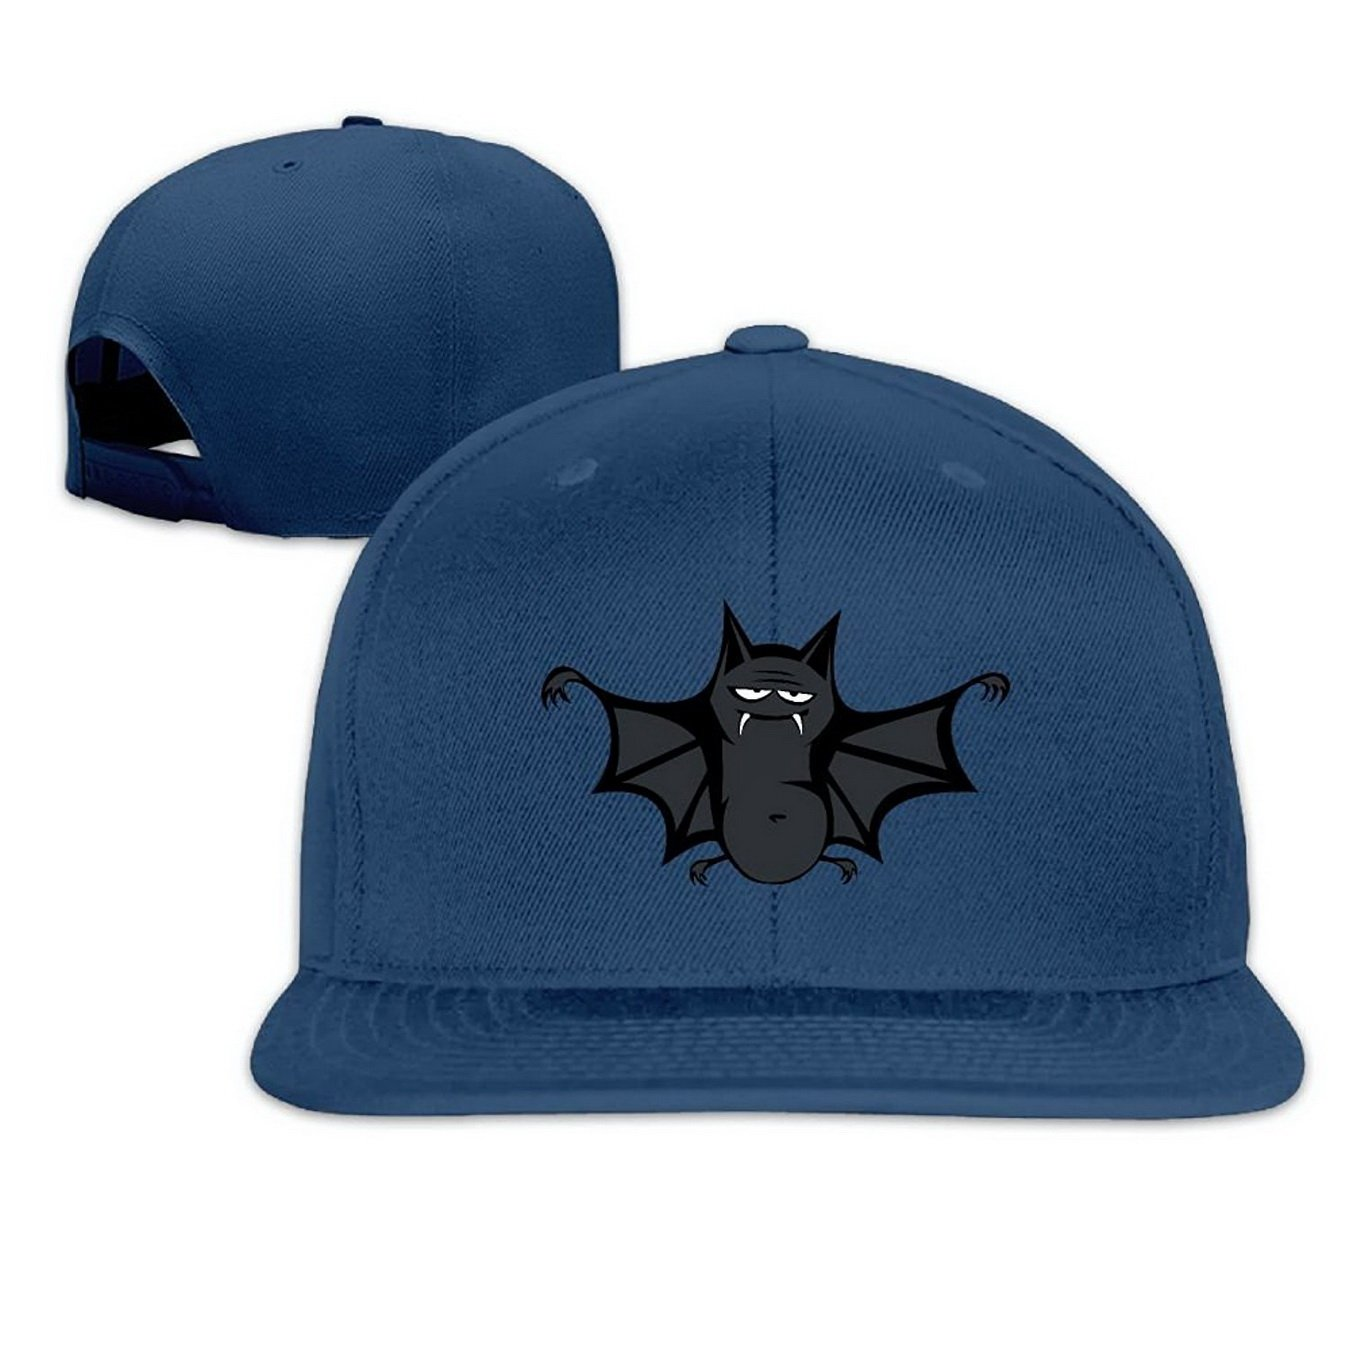 Unoopler Cute Funny Bat Snapback Hip Hop Flat Bill Baseball Caps for Men Women Navy